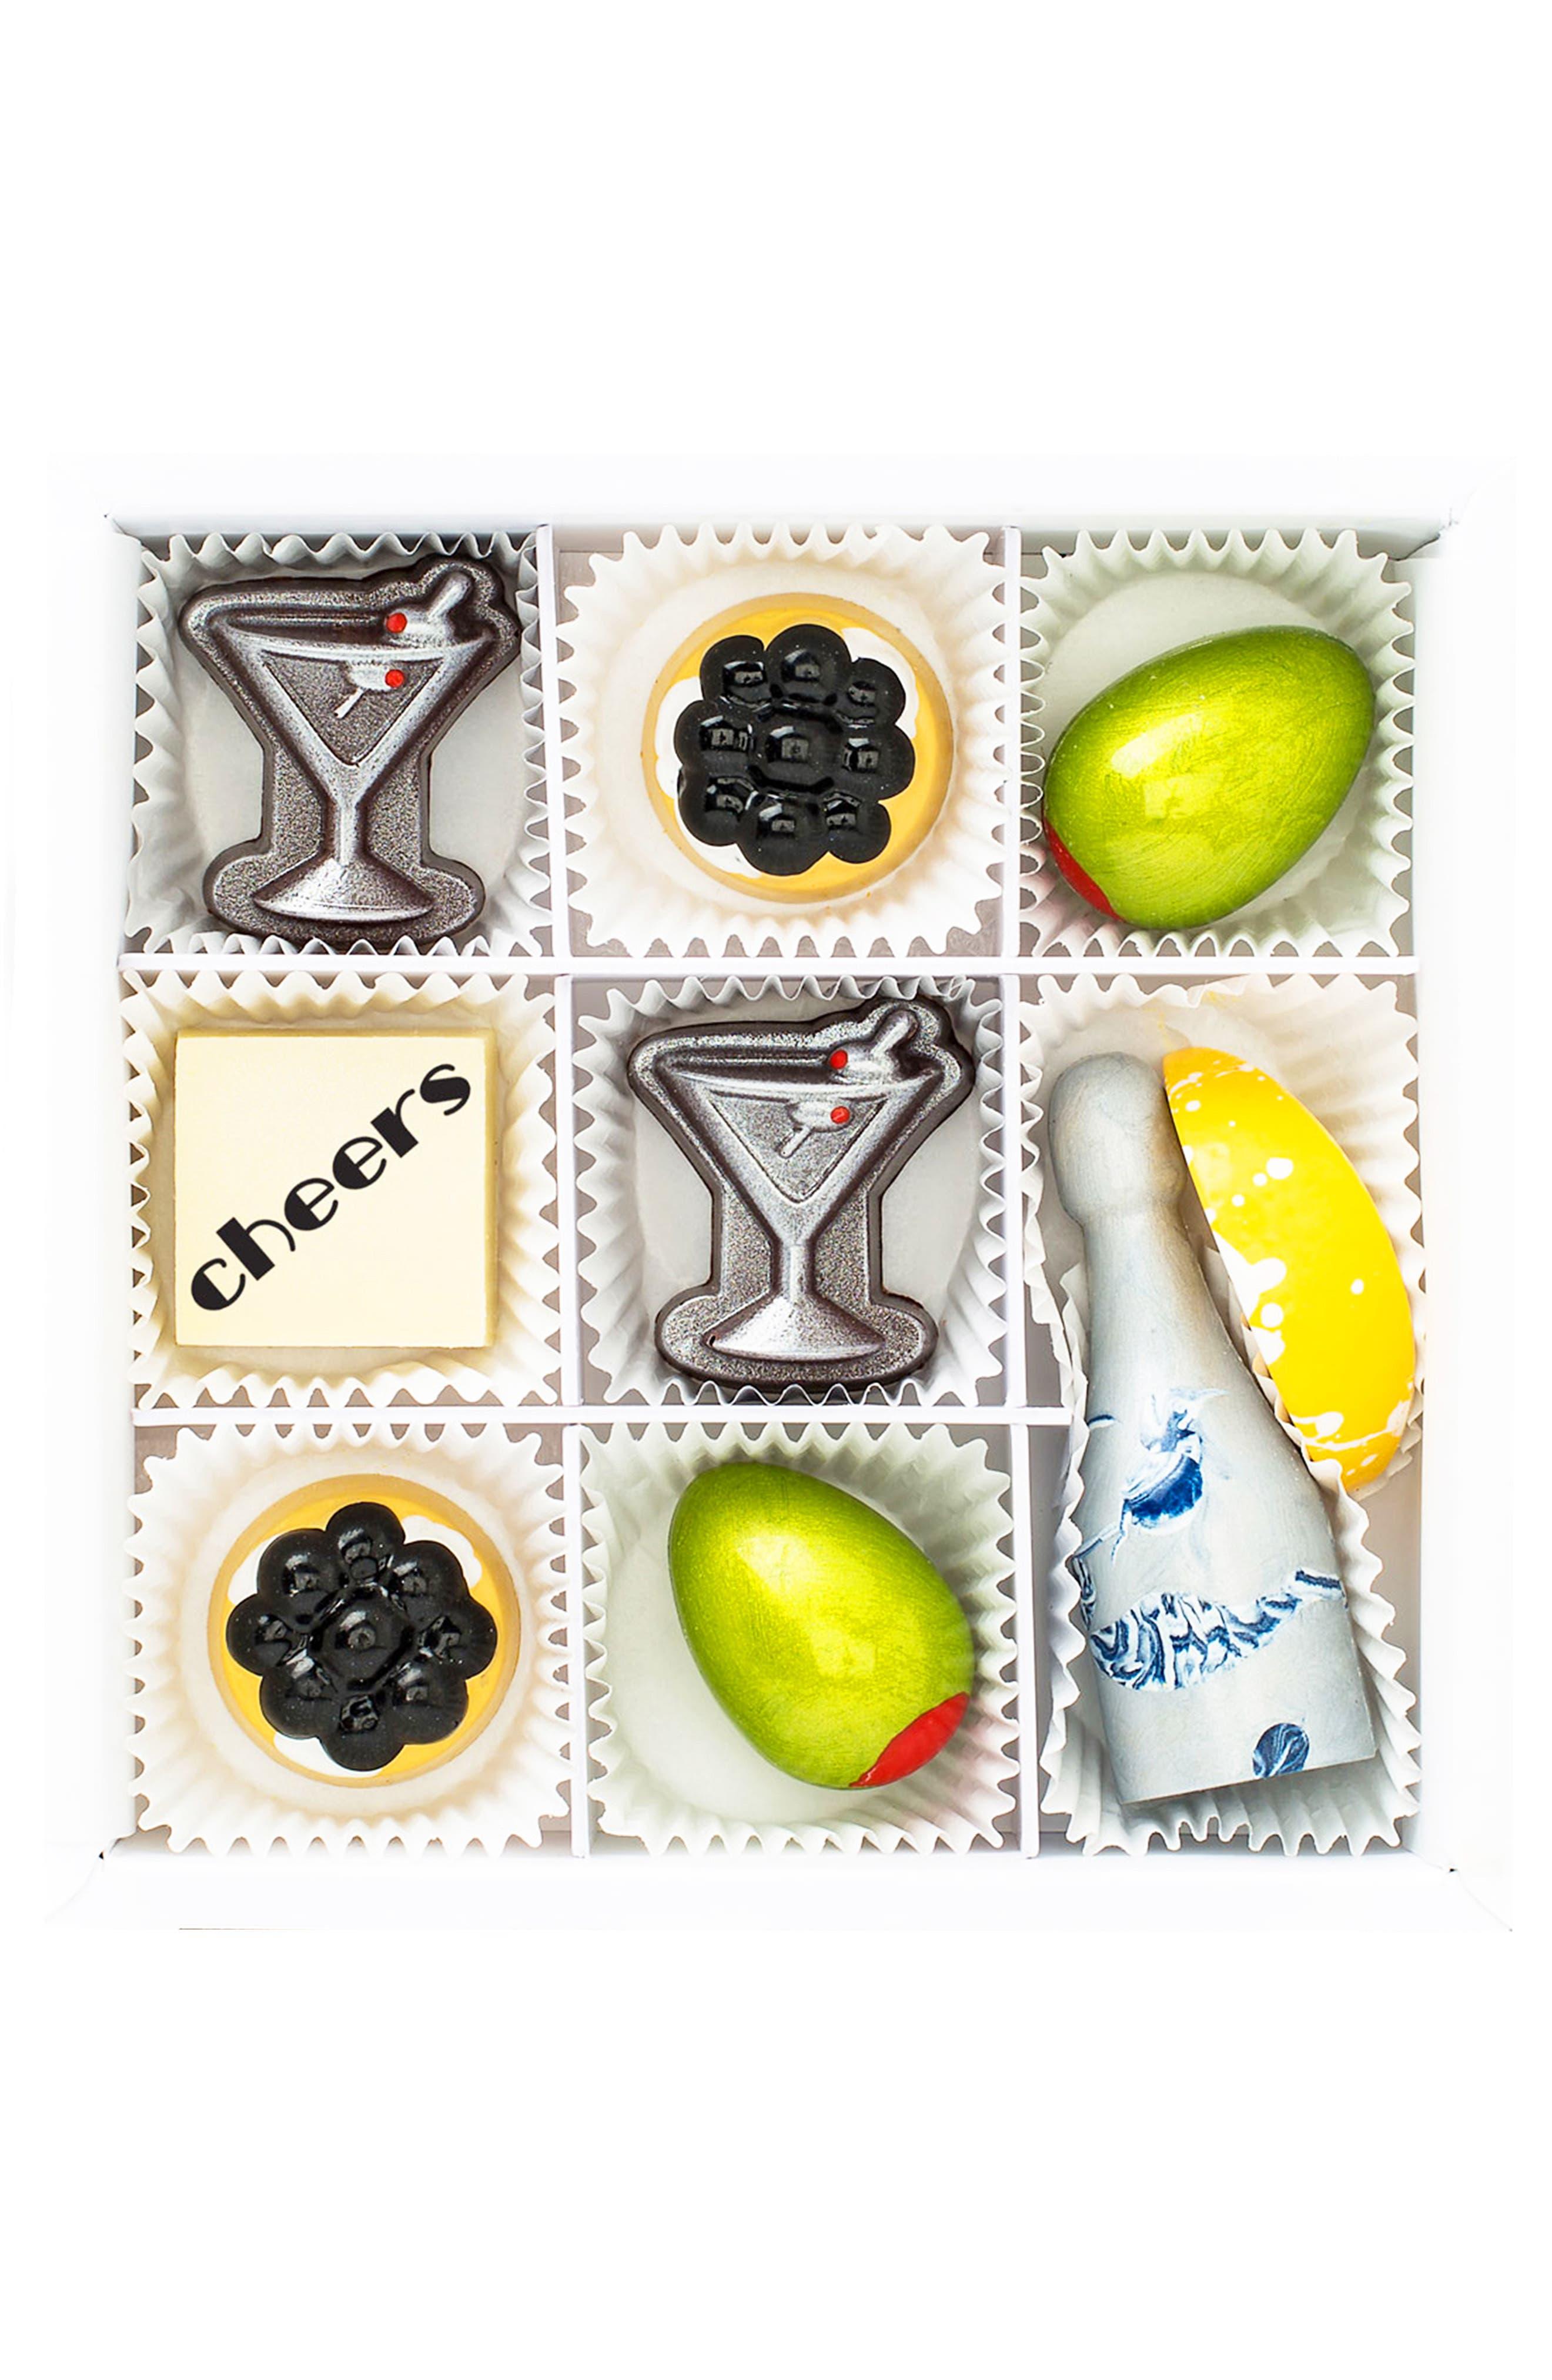 Cocktails & Caviar 9-Piece Chocolate Set,                             Main thumbnail 1, color,                             WHITE